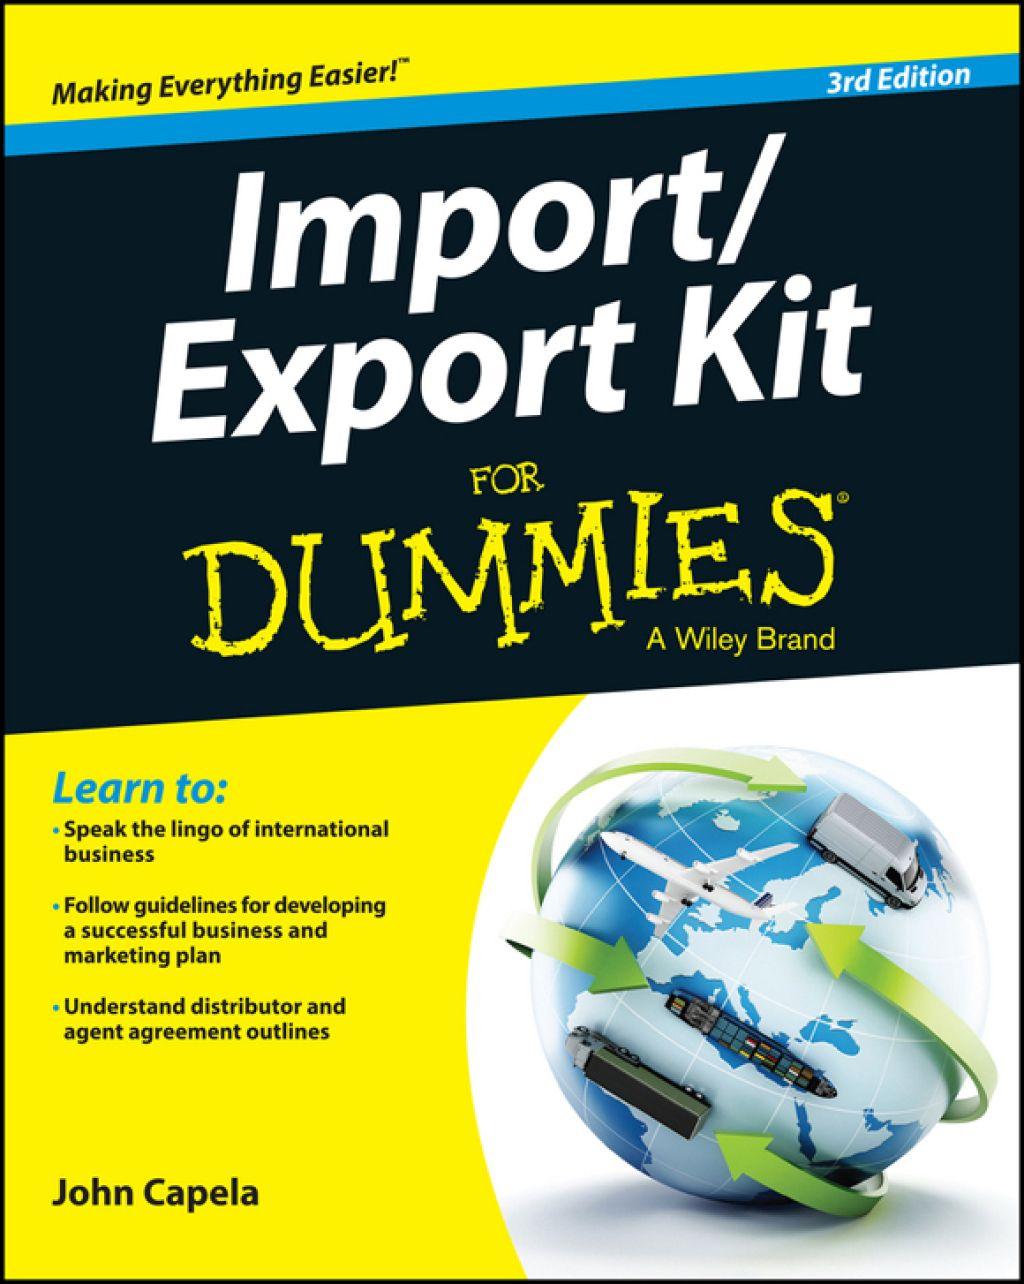 Import / Export Kit For Dummies (eBook) Capela, Ebook